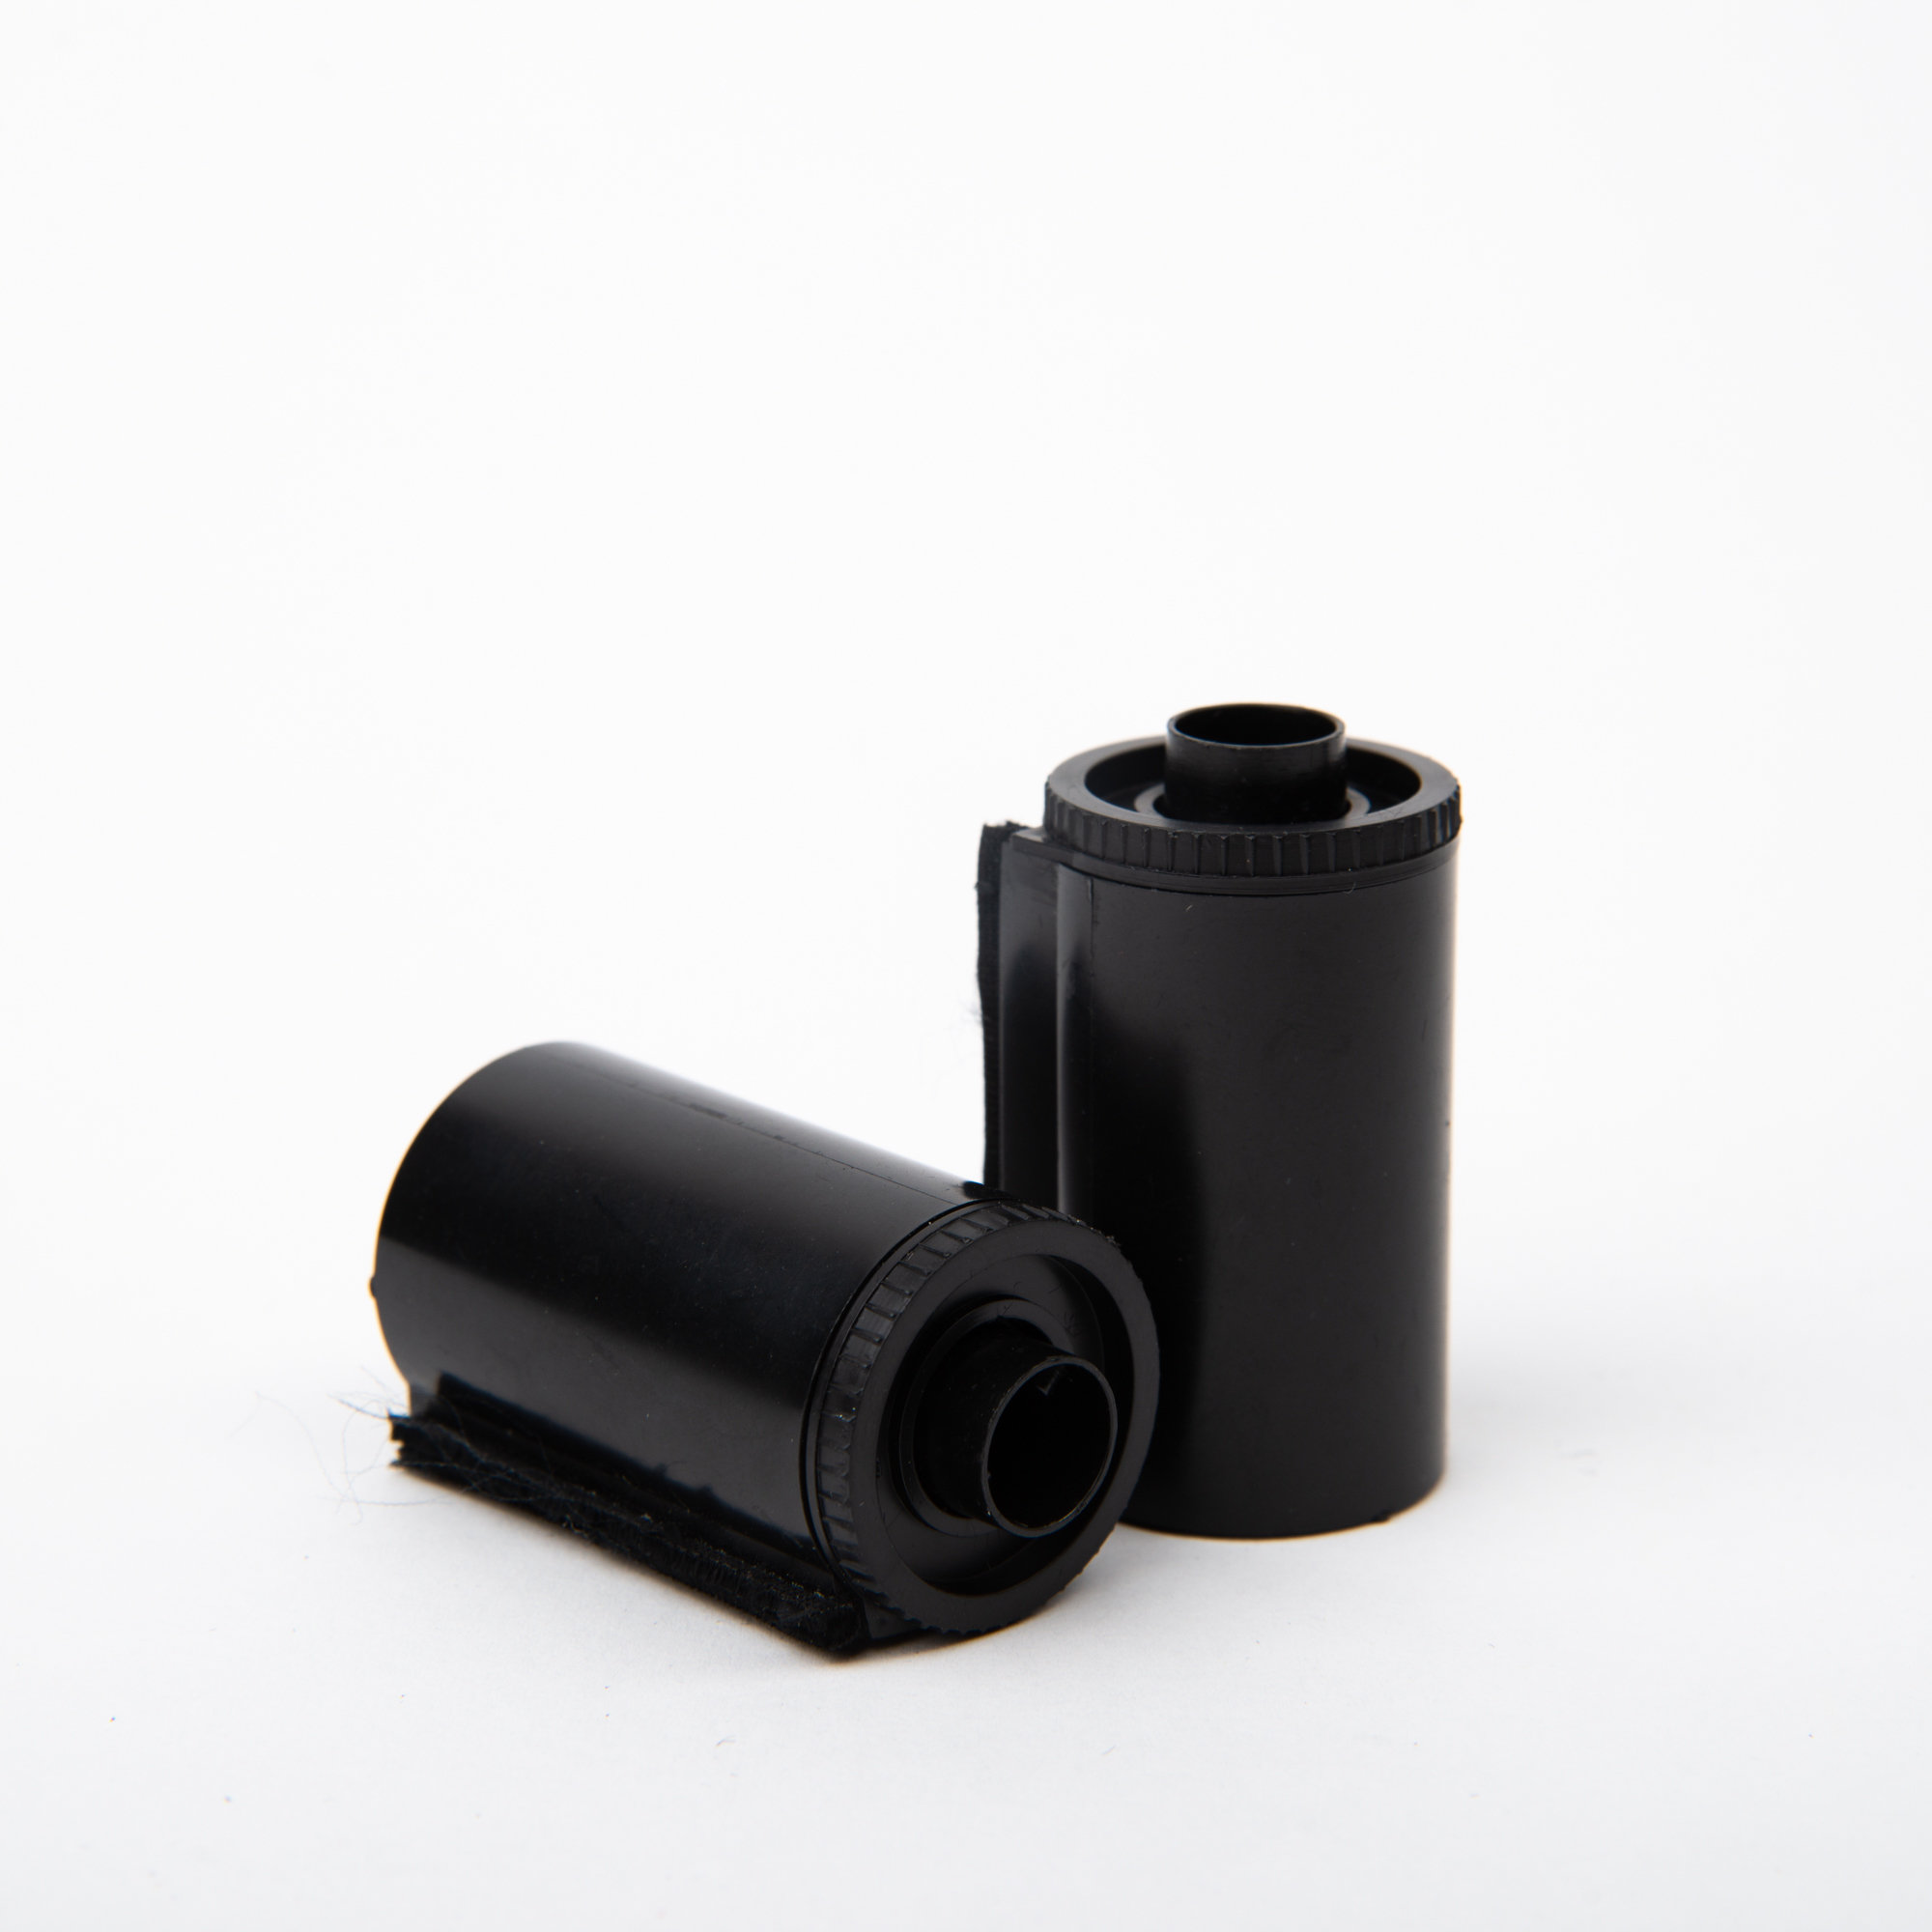 Кассета для 35 мм пленки